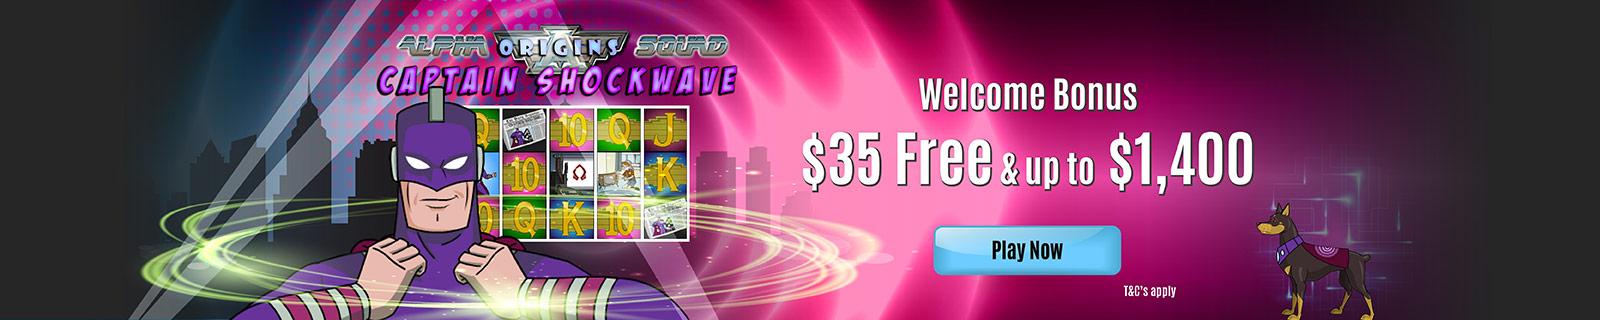 Jackpot Wheel No Deposit Bonus $35 FREE up to $1400 Welcome Bonus